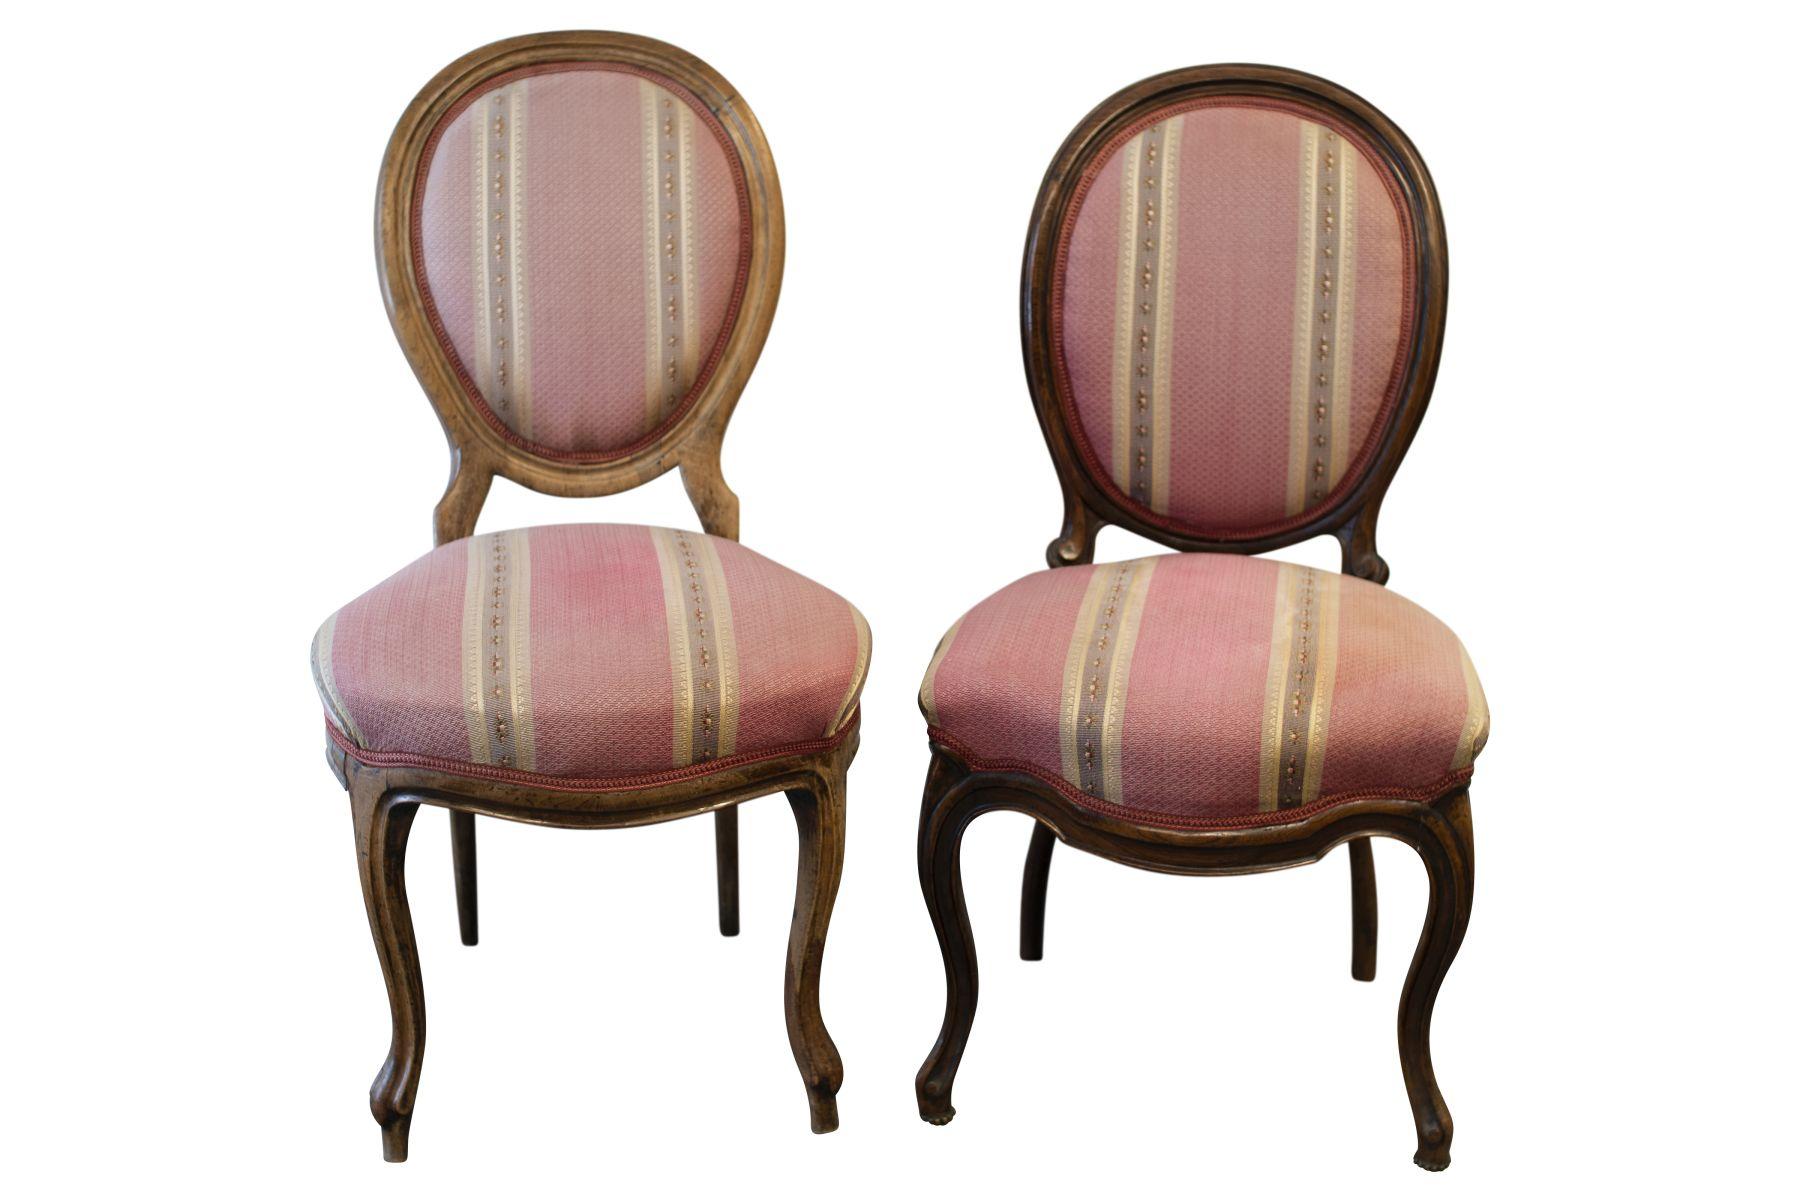 #35 Biedermeier Salon Chairs   Salonstühle Biedermeier Image